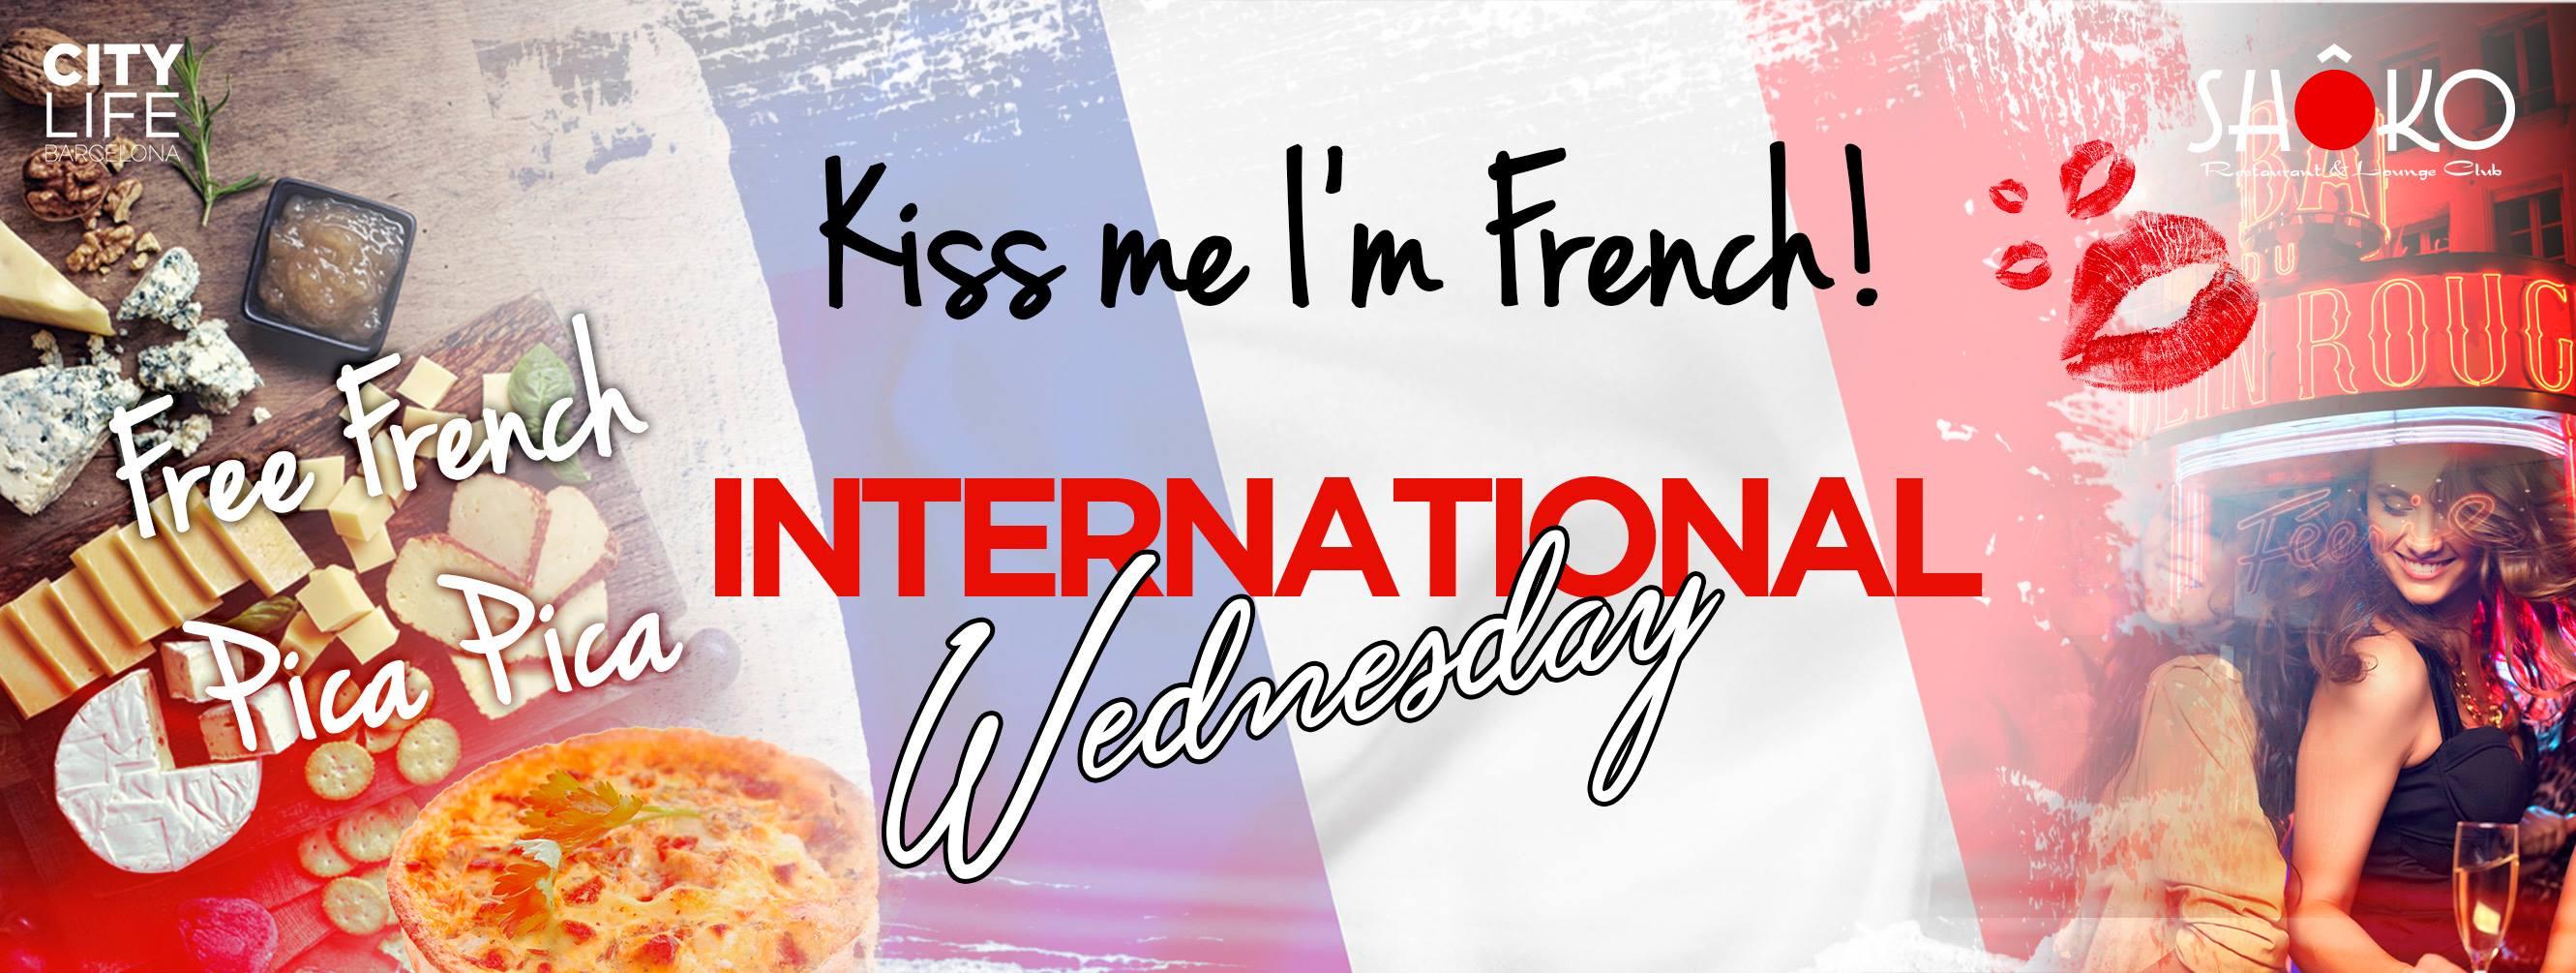 Kiss me I'm French - Free Dinner & Free Open Bar! @Shoko Lounge Club!